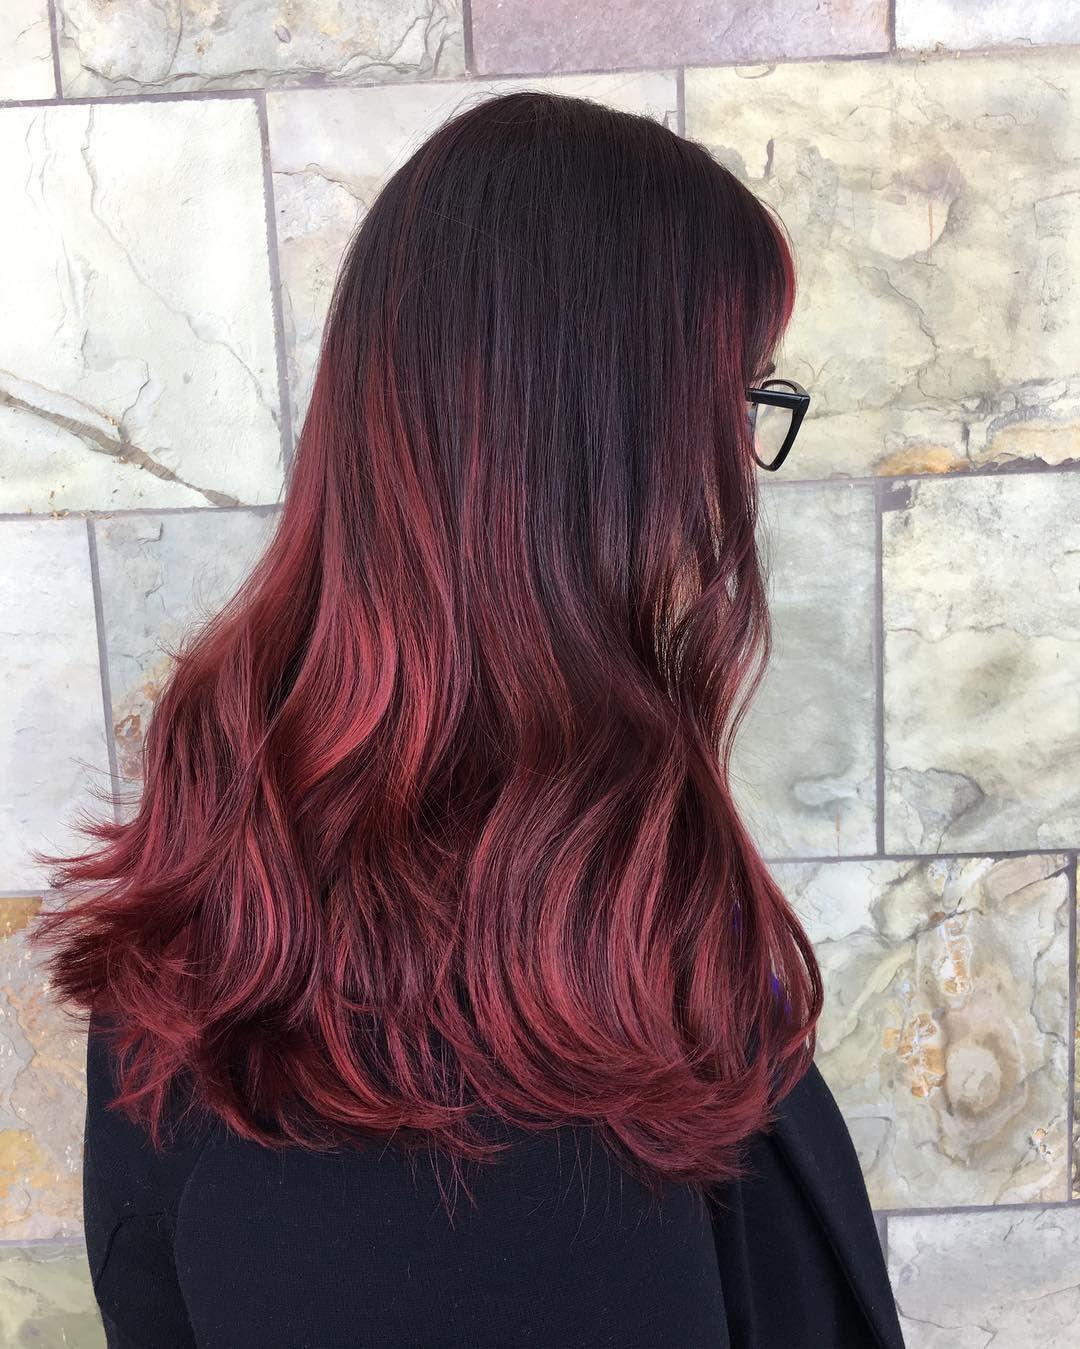 Cherrybomb Hair By Amanda Instagram Mandas So Fetch Works At The Rose Hair Studio Rose Hair Hair Studio Hair